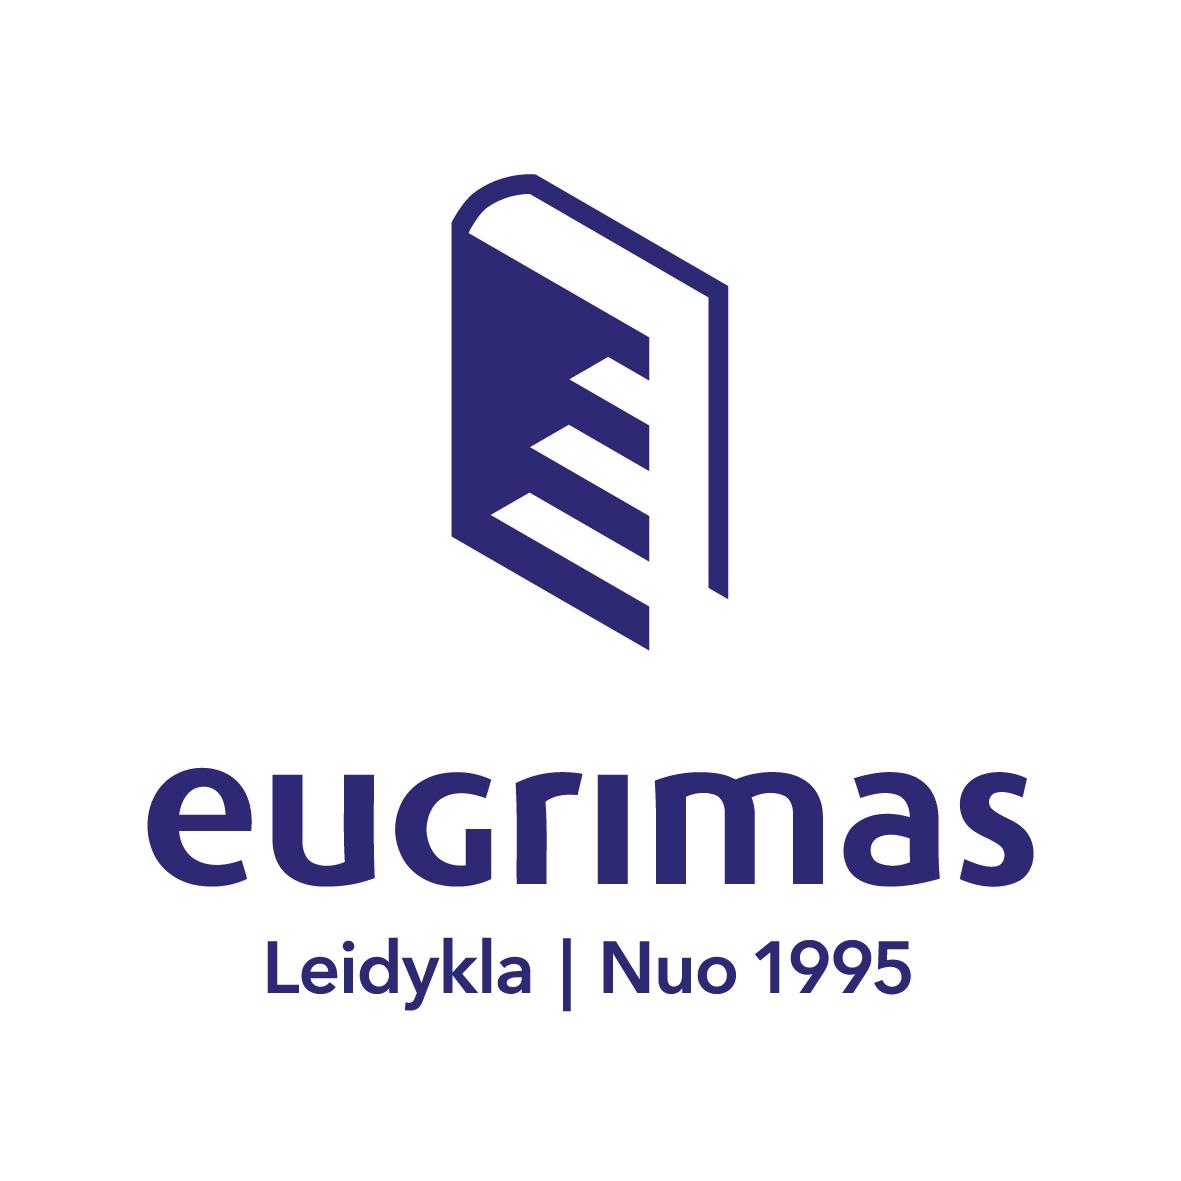 Eugrimas